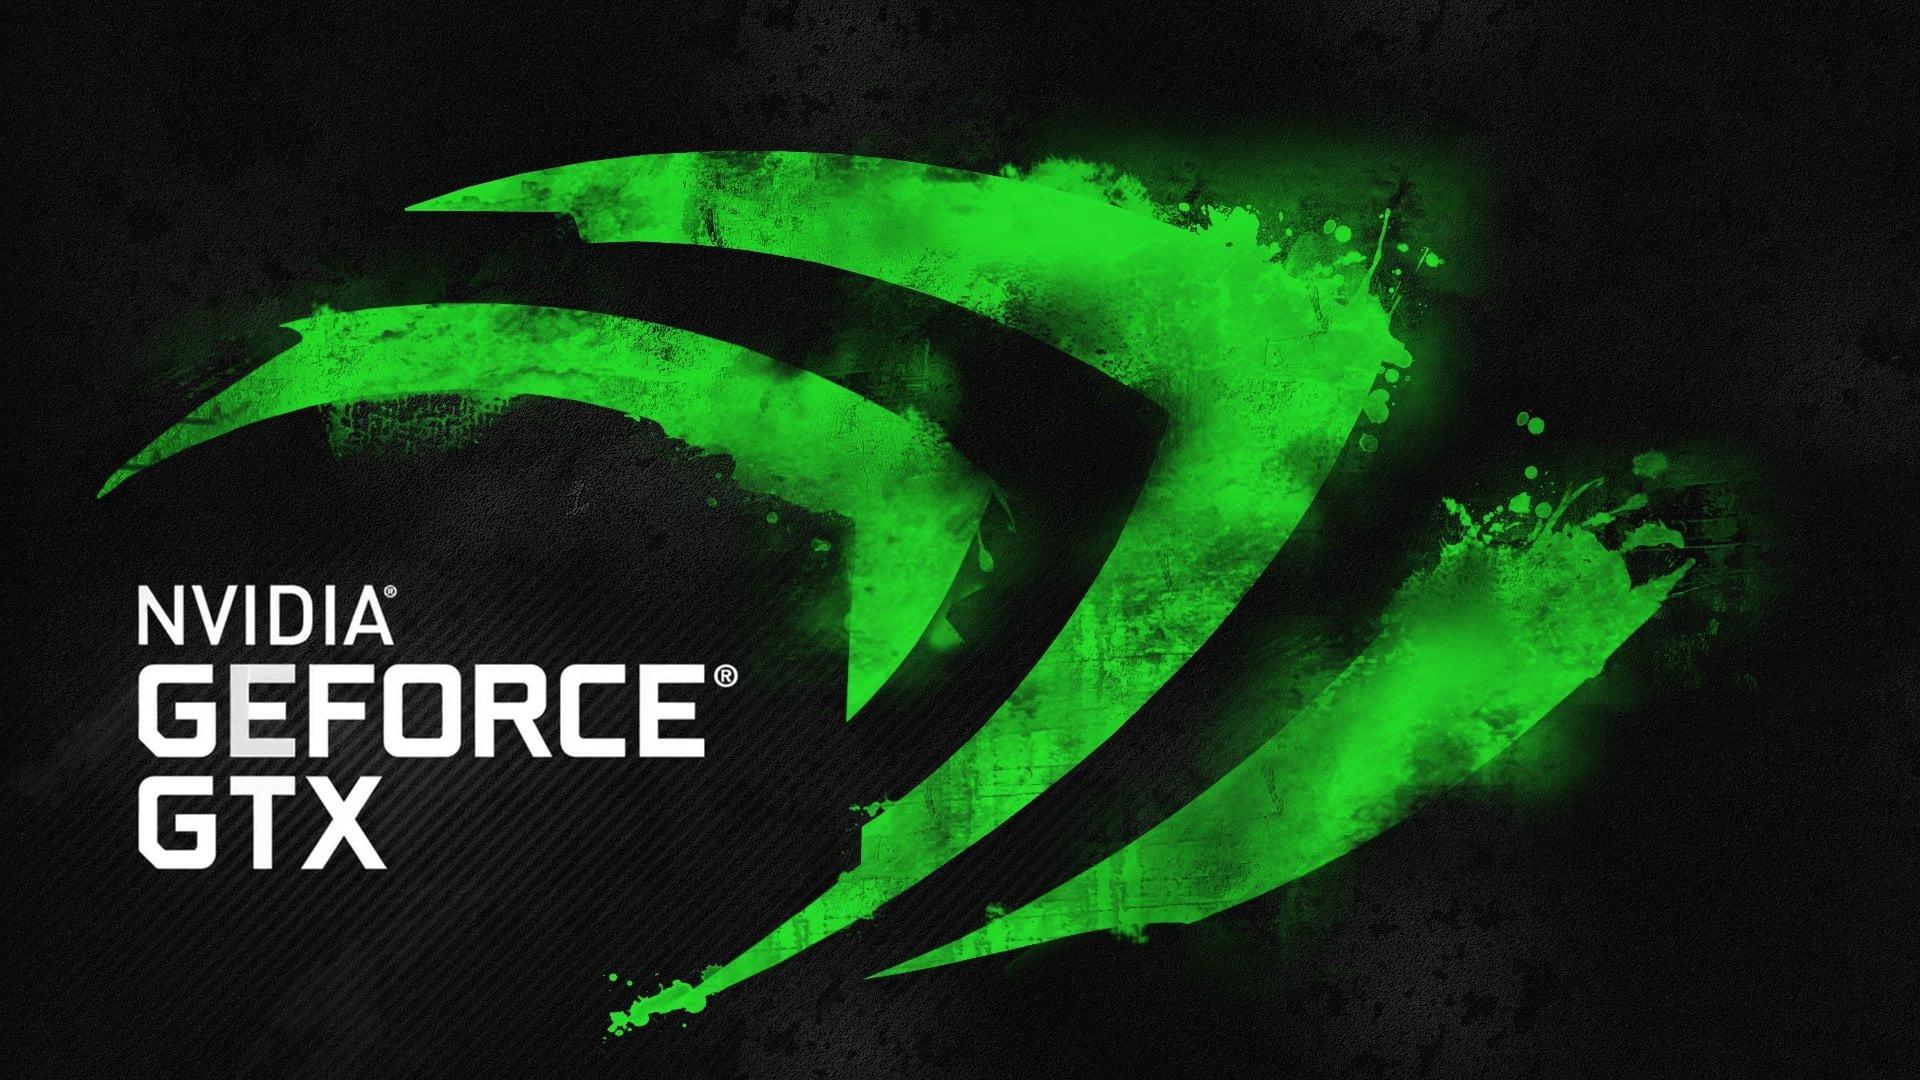 NVIDIA GeForce 460.89